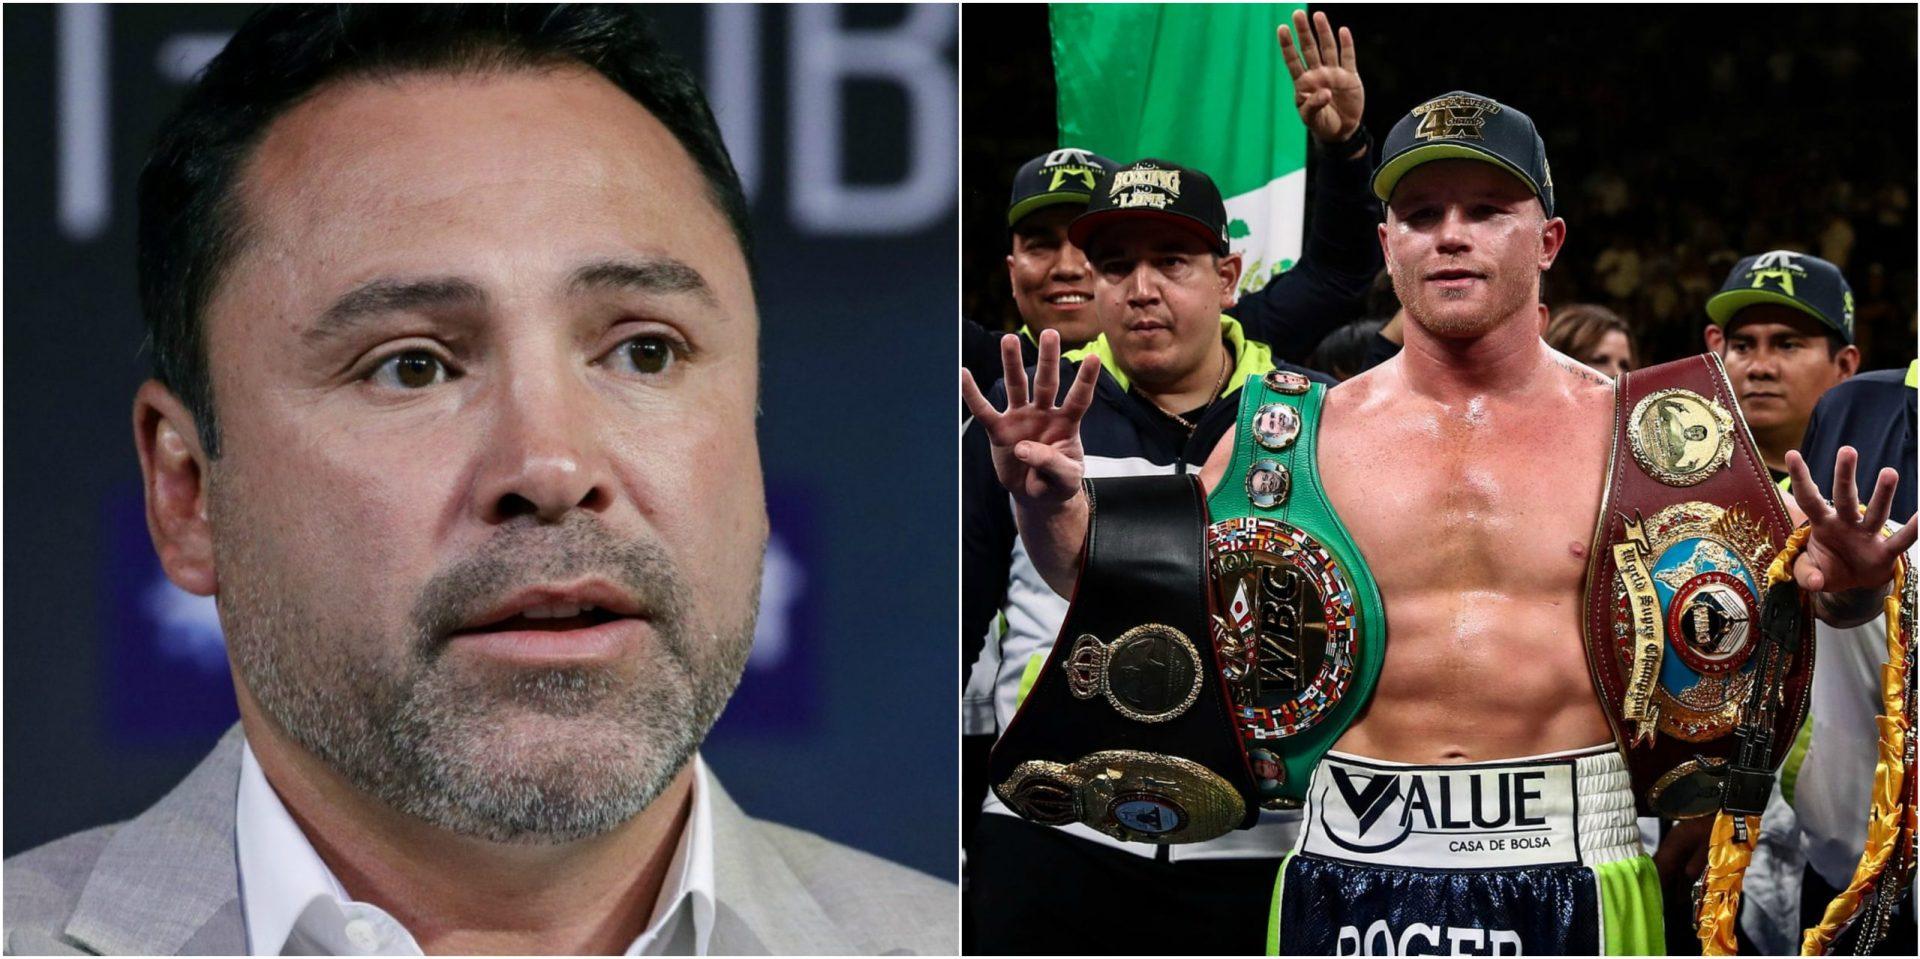 Oscar De La Hoya was 'hurt' over Canelo Álvarez and Golden Boy split - THE SPORTS ROOM